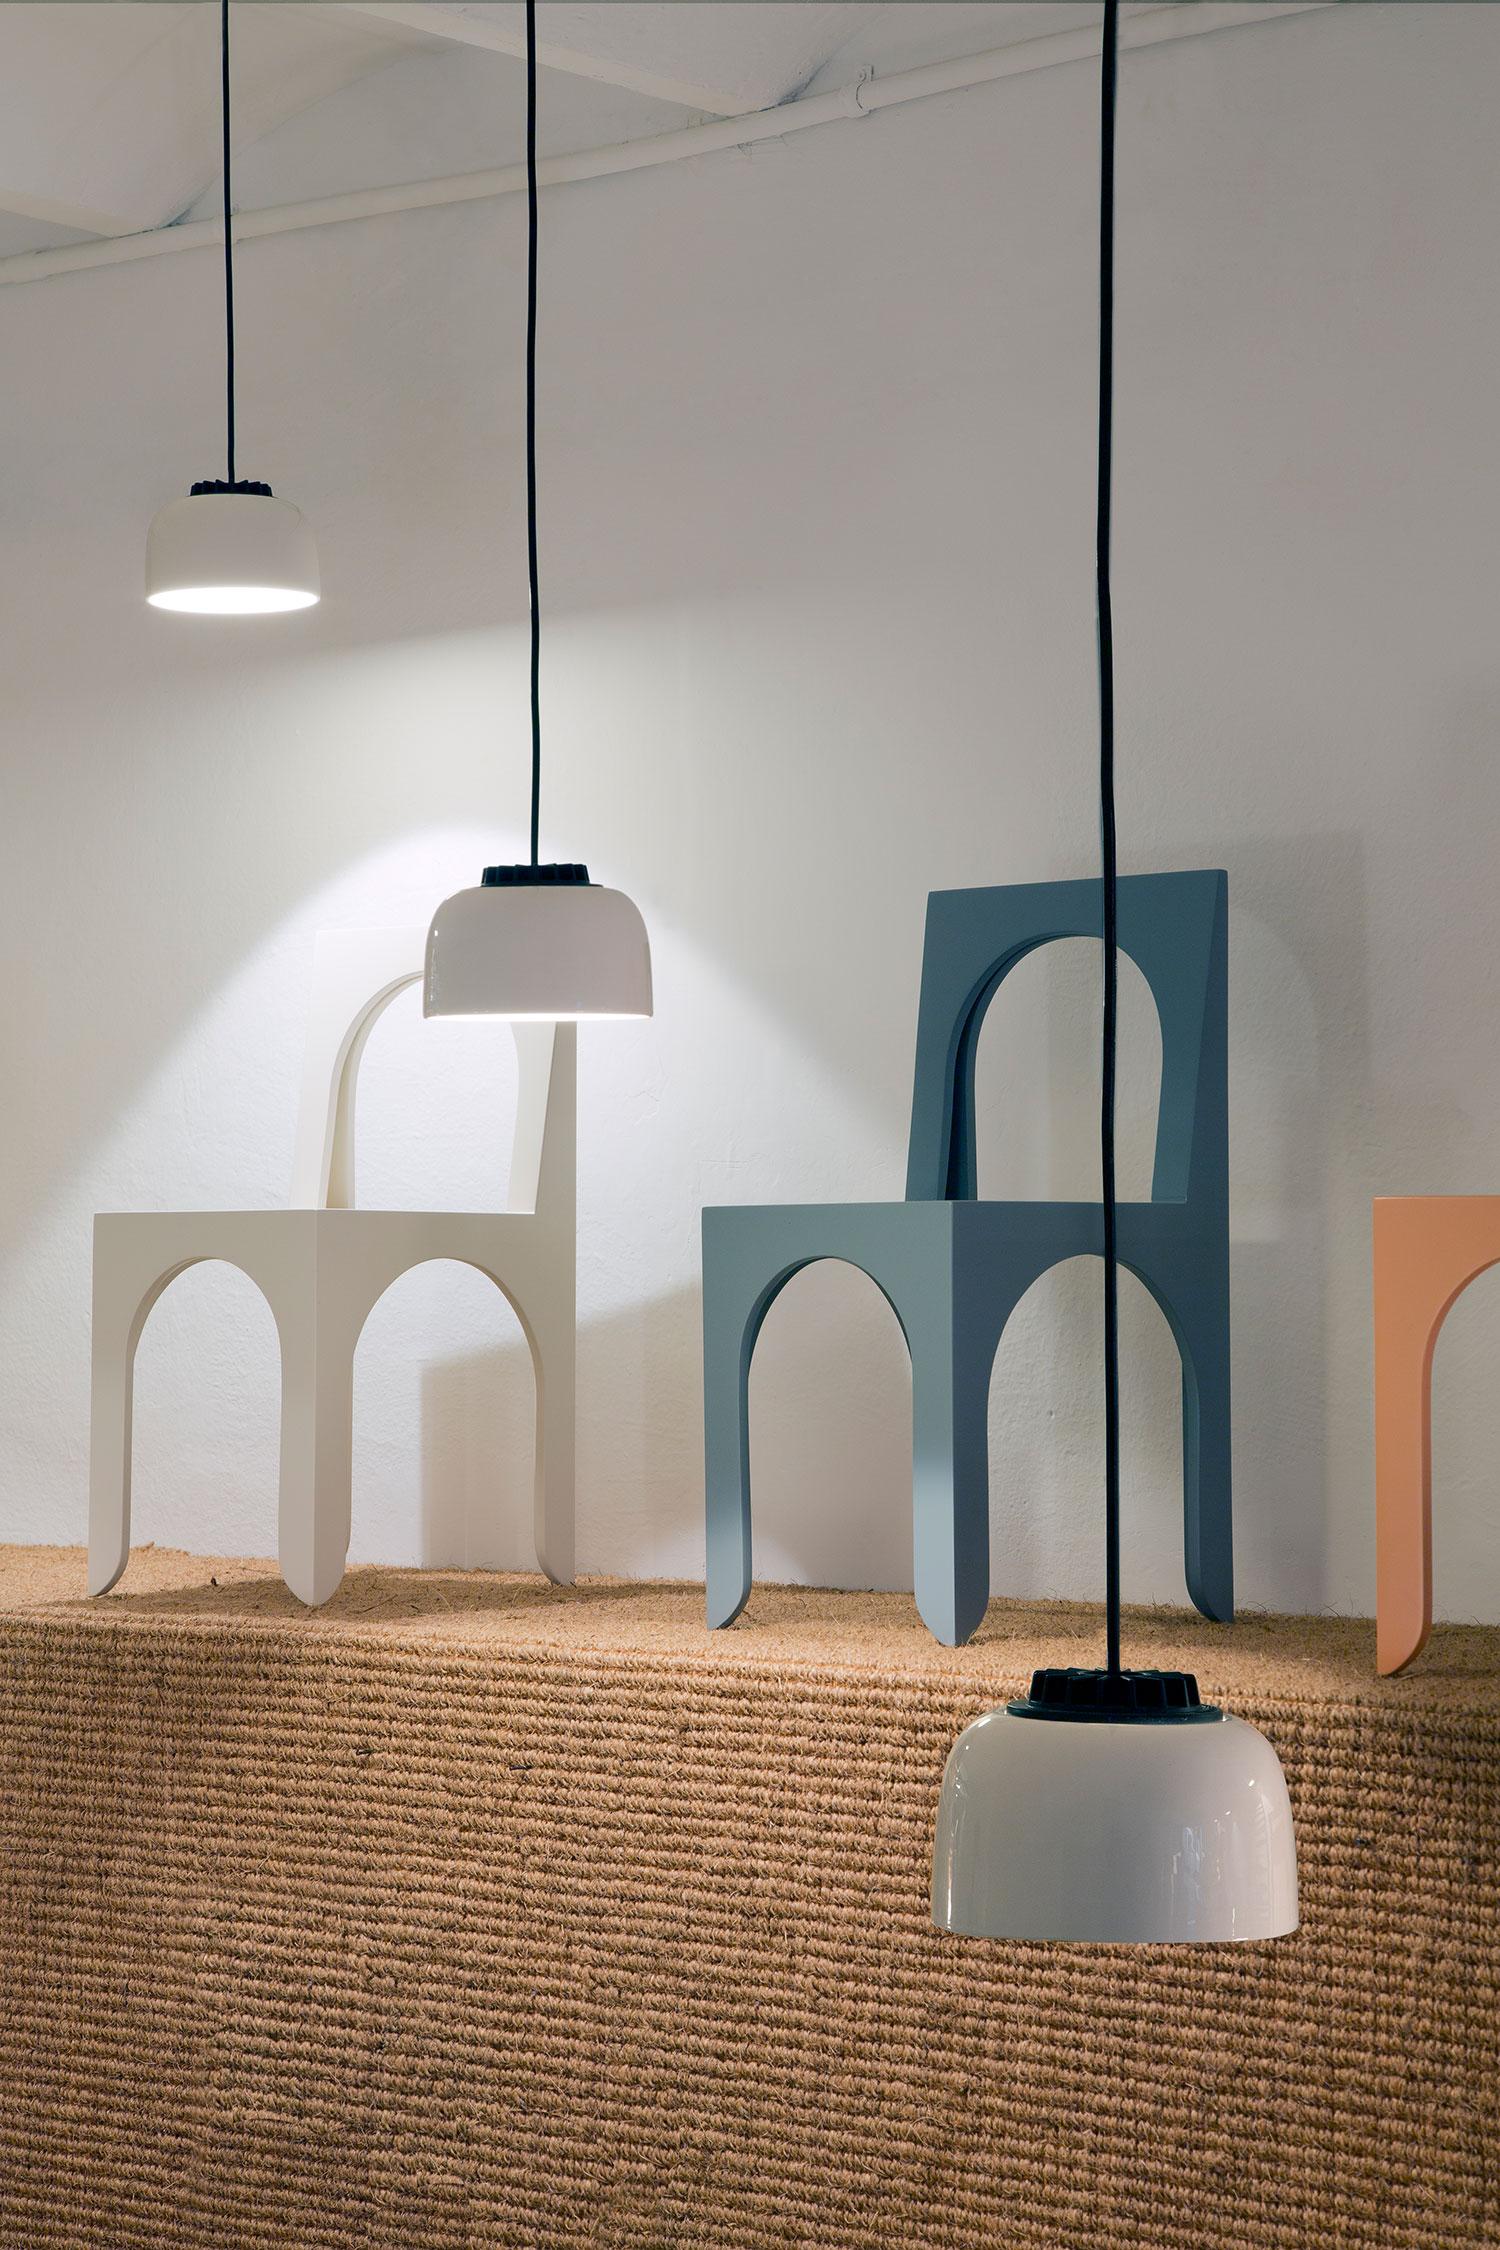 SANTACOLE_PENDANT_LAMPS_HeadHat_Bowl_HeadHat_Bowl_S_Varela__Jara_18-web.jpg